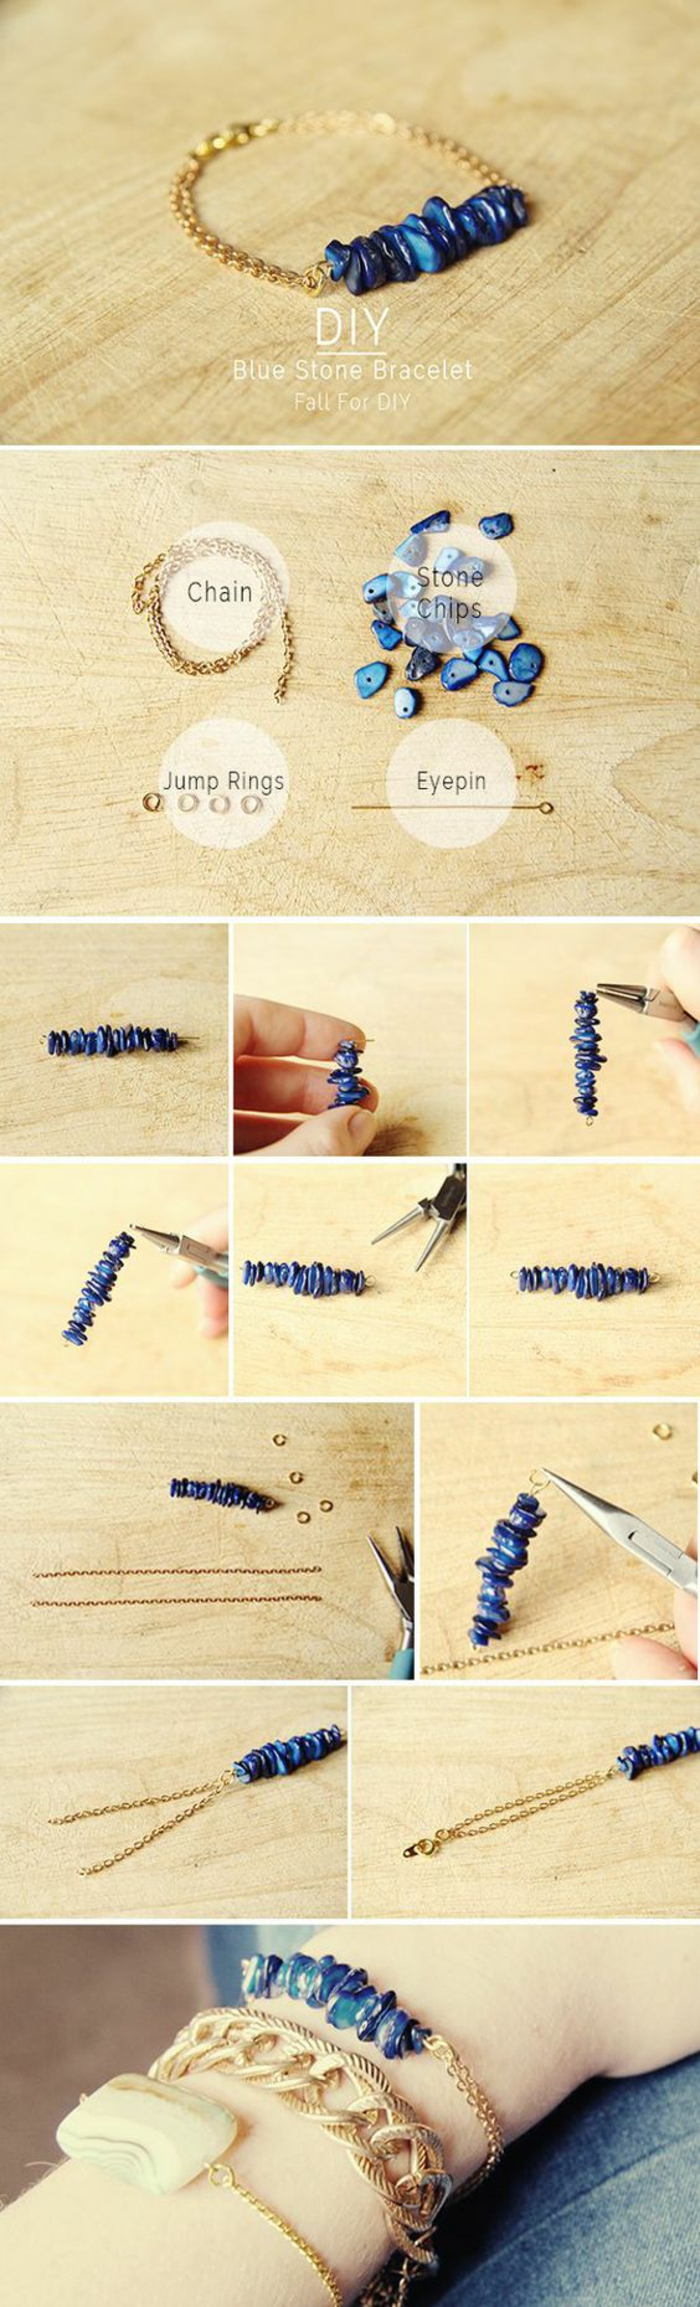 Armbänder selber machen: Kettenarmband aus Lapislazuli-Steinen, Schmuckzangen, Kettenstift, Biegeringe